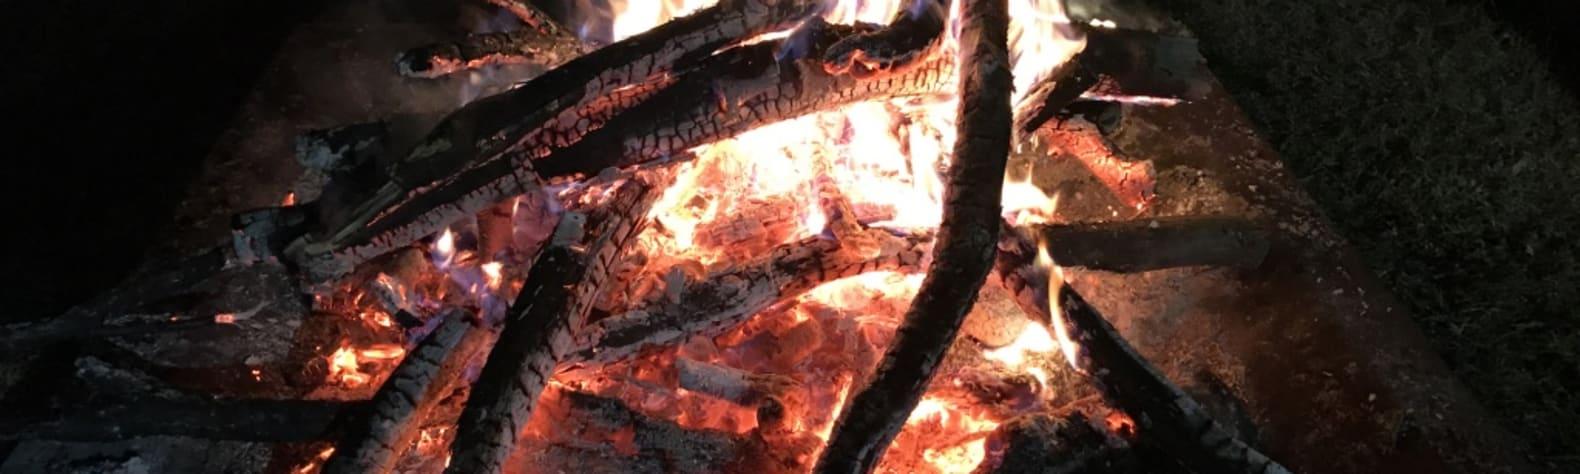 Leatherwood Camping Flats